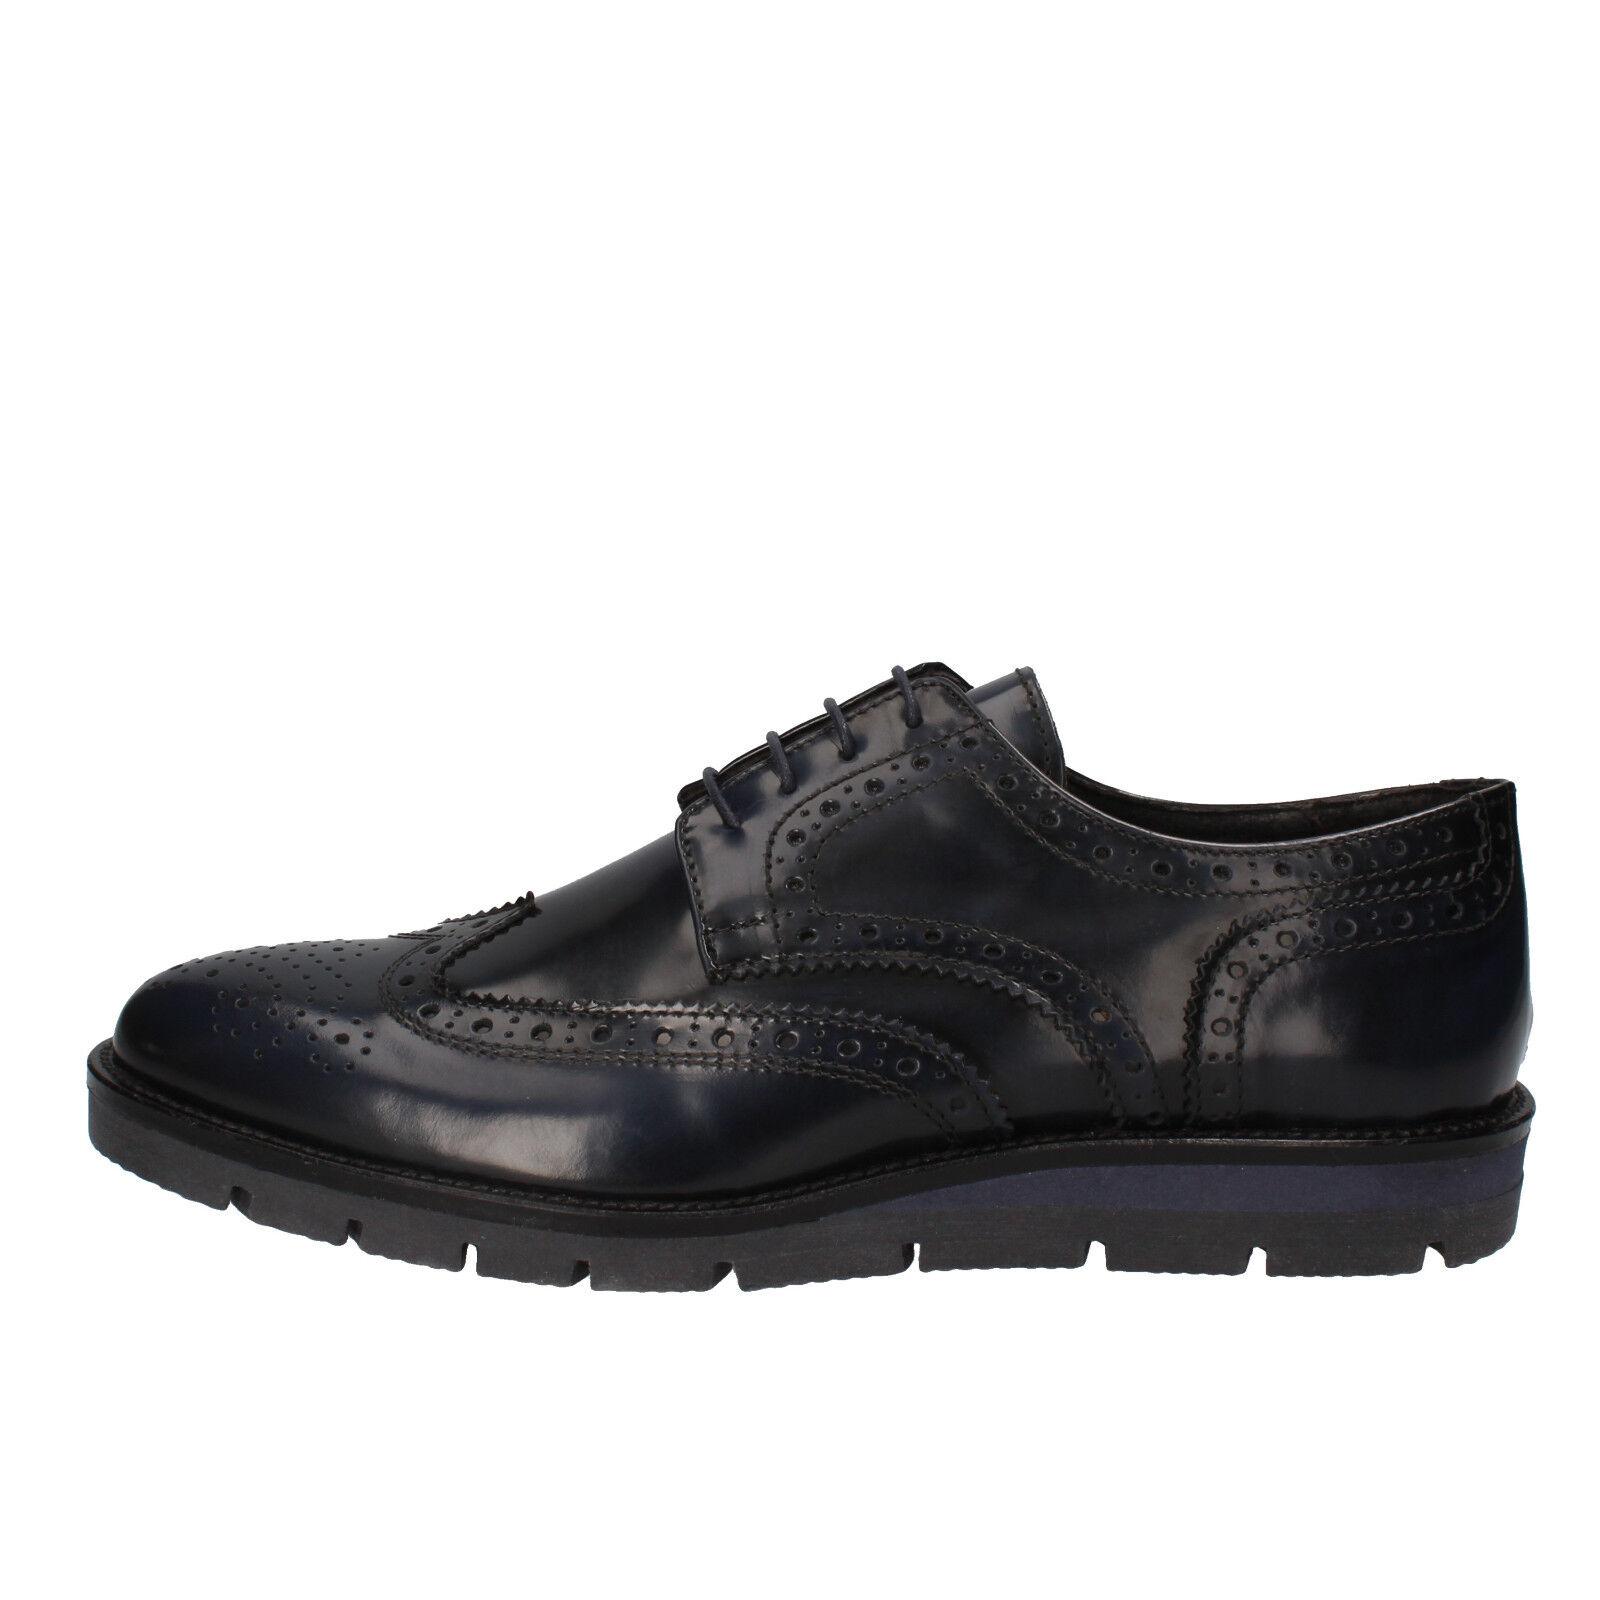 scarpe uomo J BREITLIN 42 EU classiche blu pelle lucida AD13-C